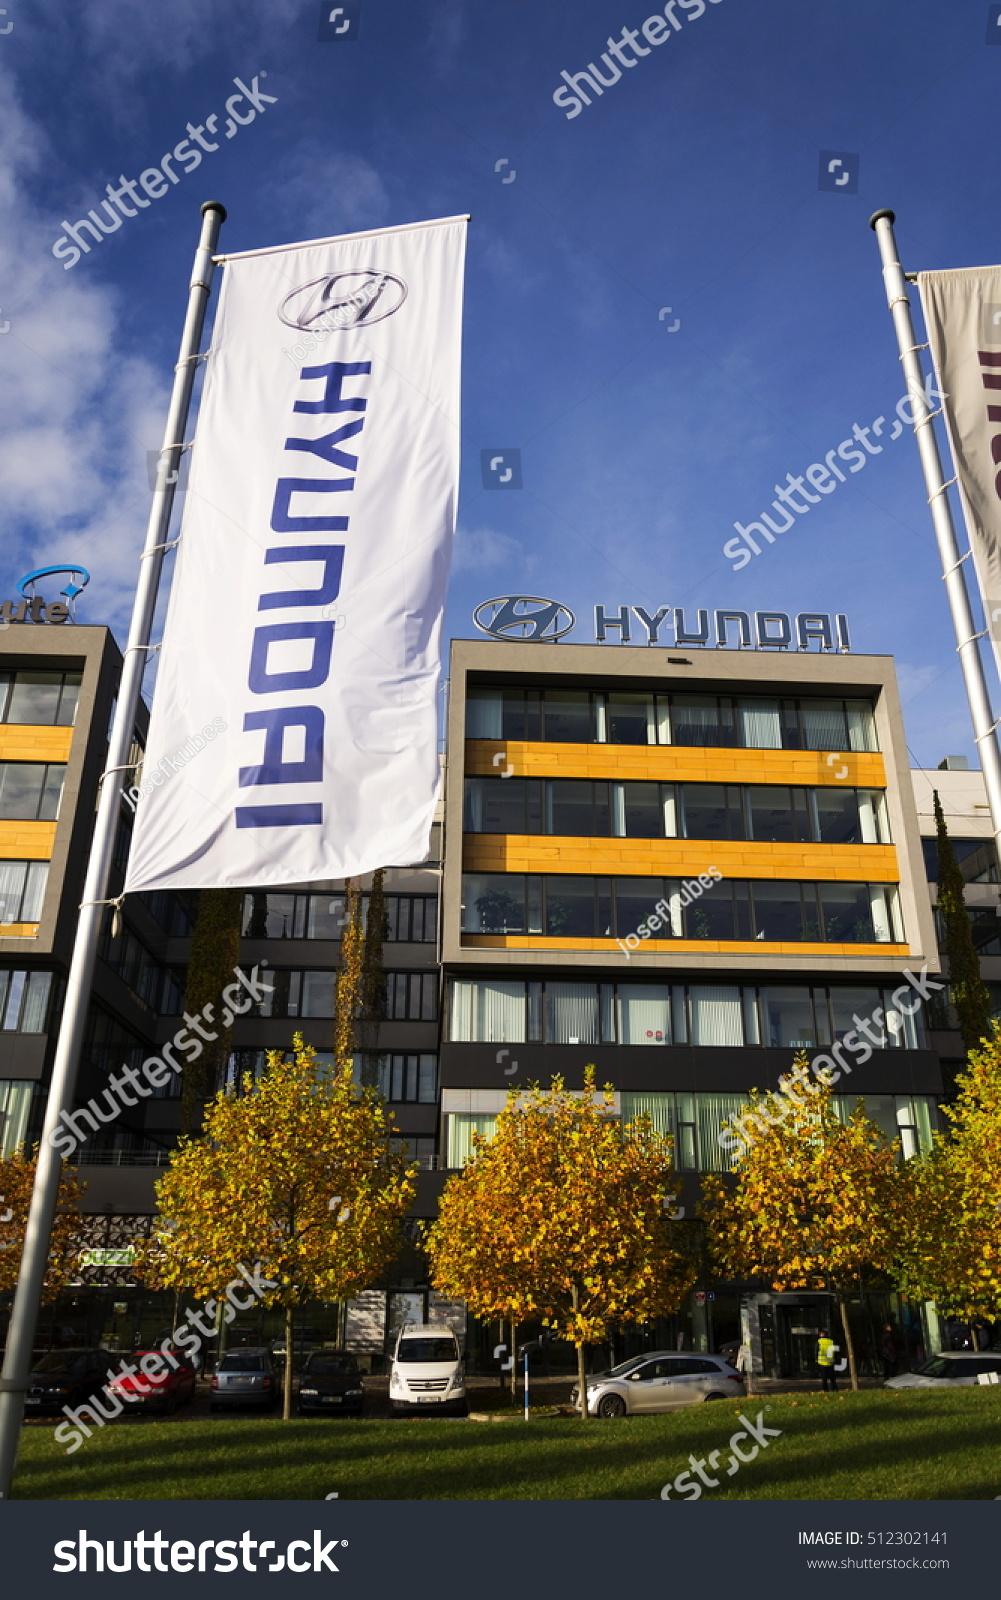 Prague czech republic november 7 hyundai stock photo for Hyundai motor finance corporate office